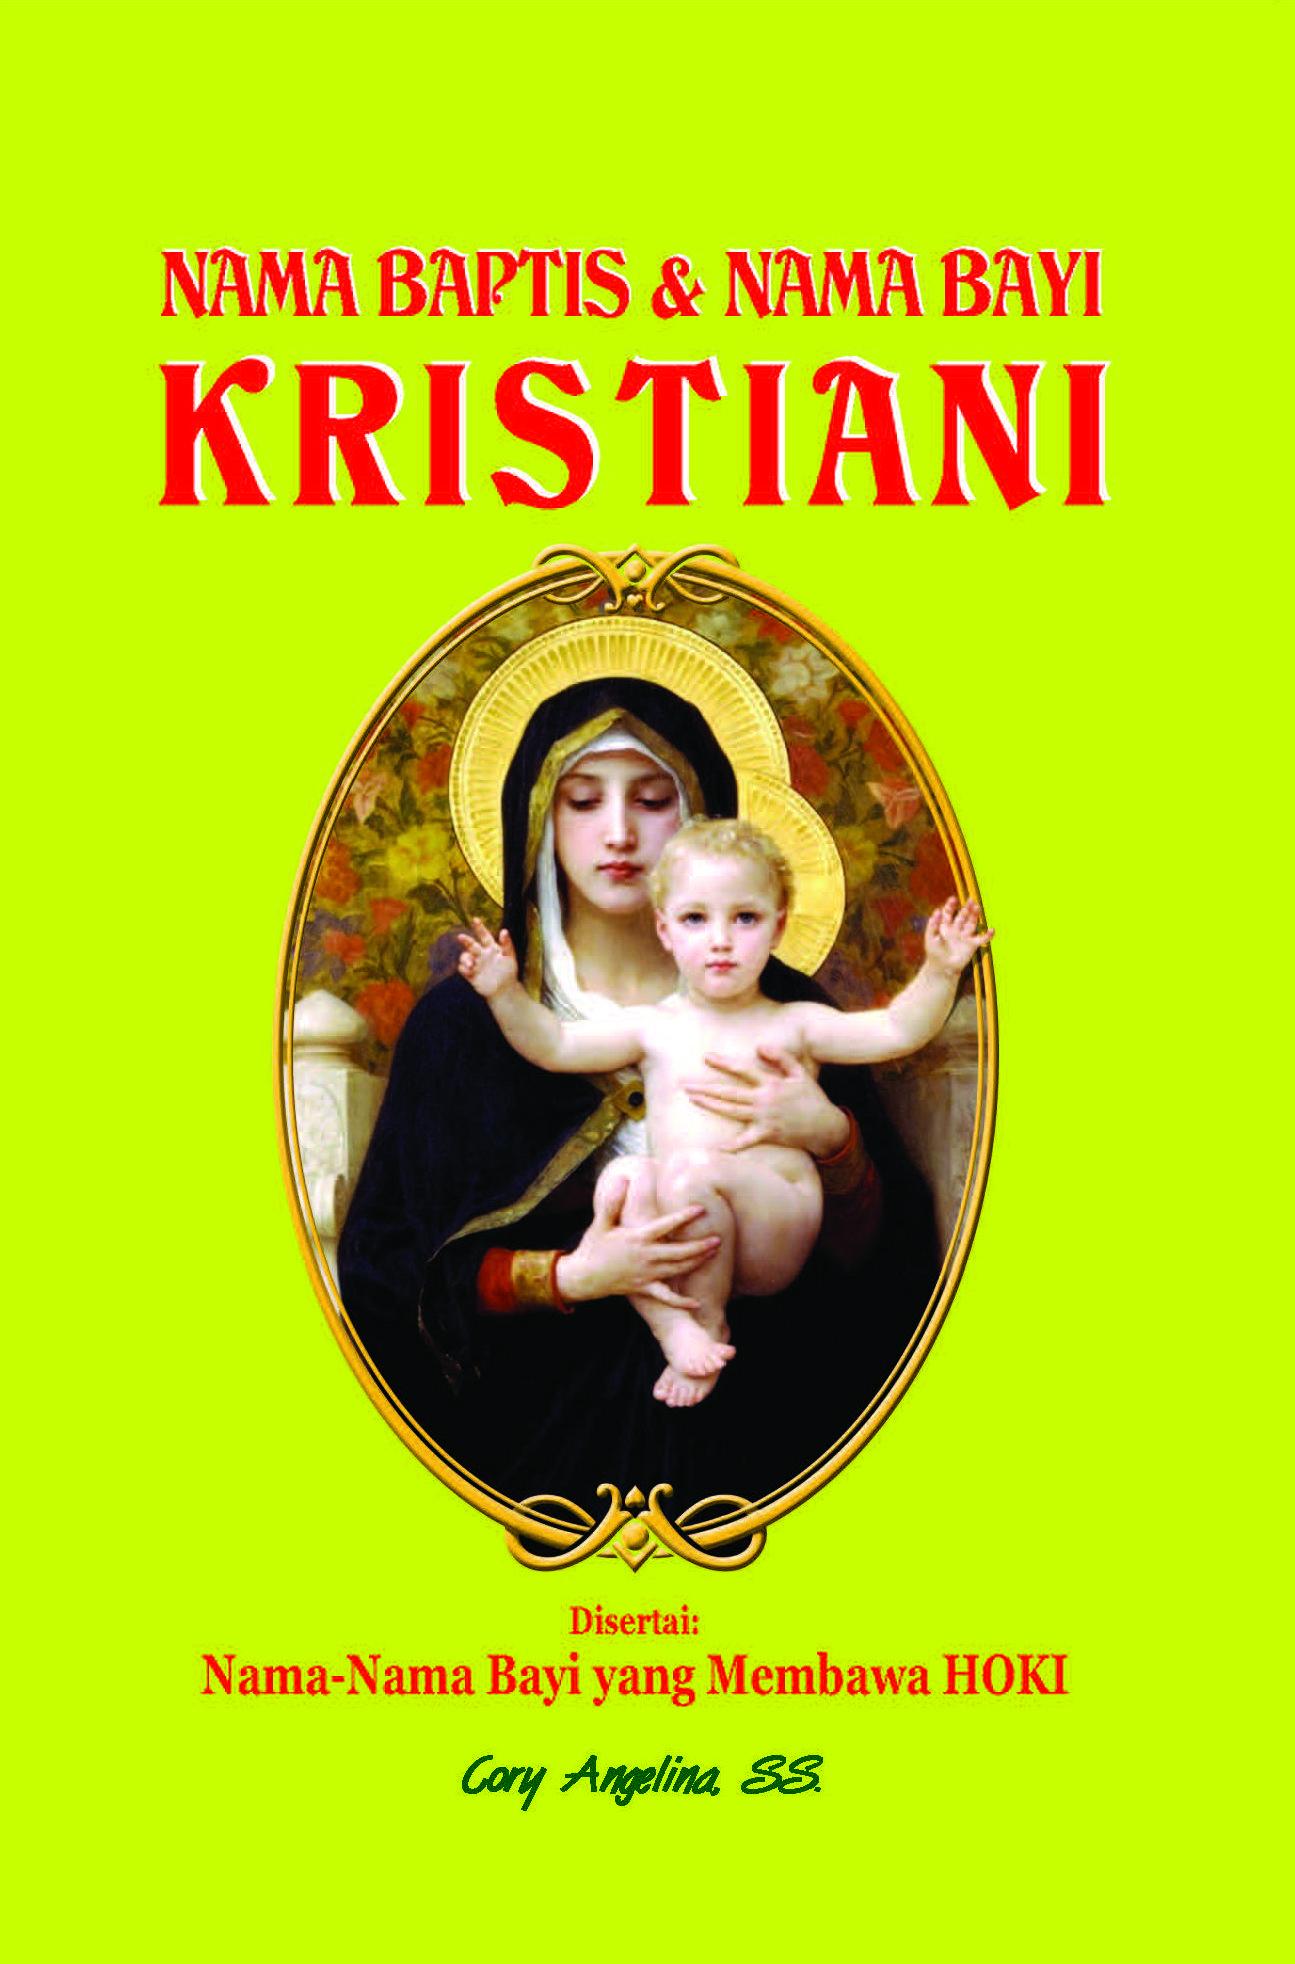 Nama Bayi Kristiani - Nama Baptis dan Nama Bayi Kristiani